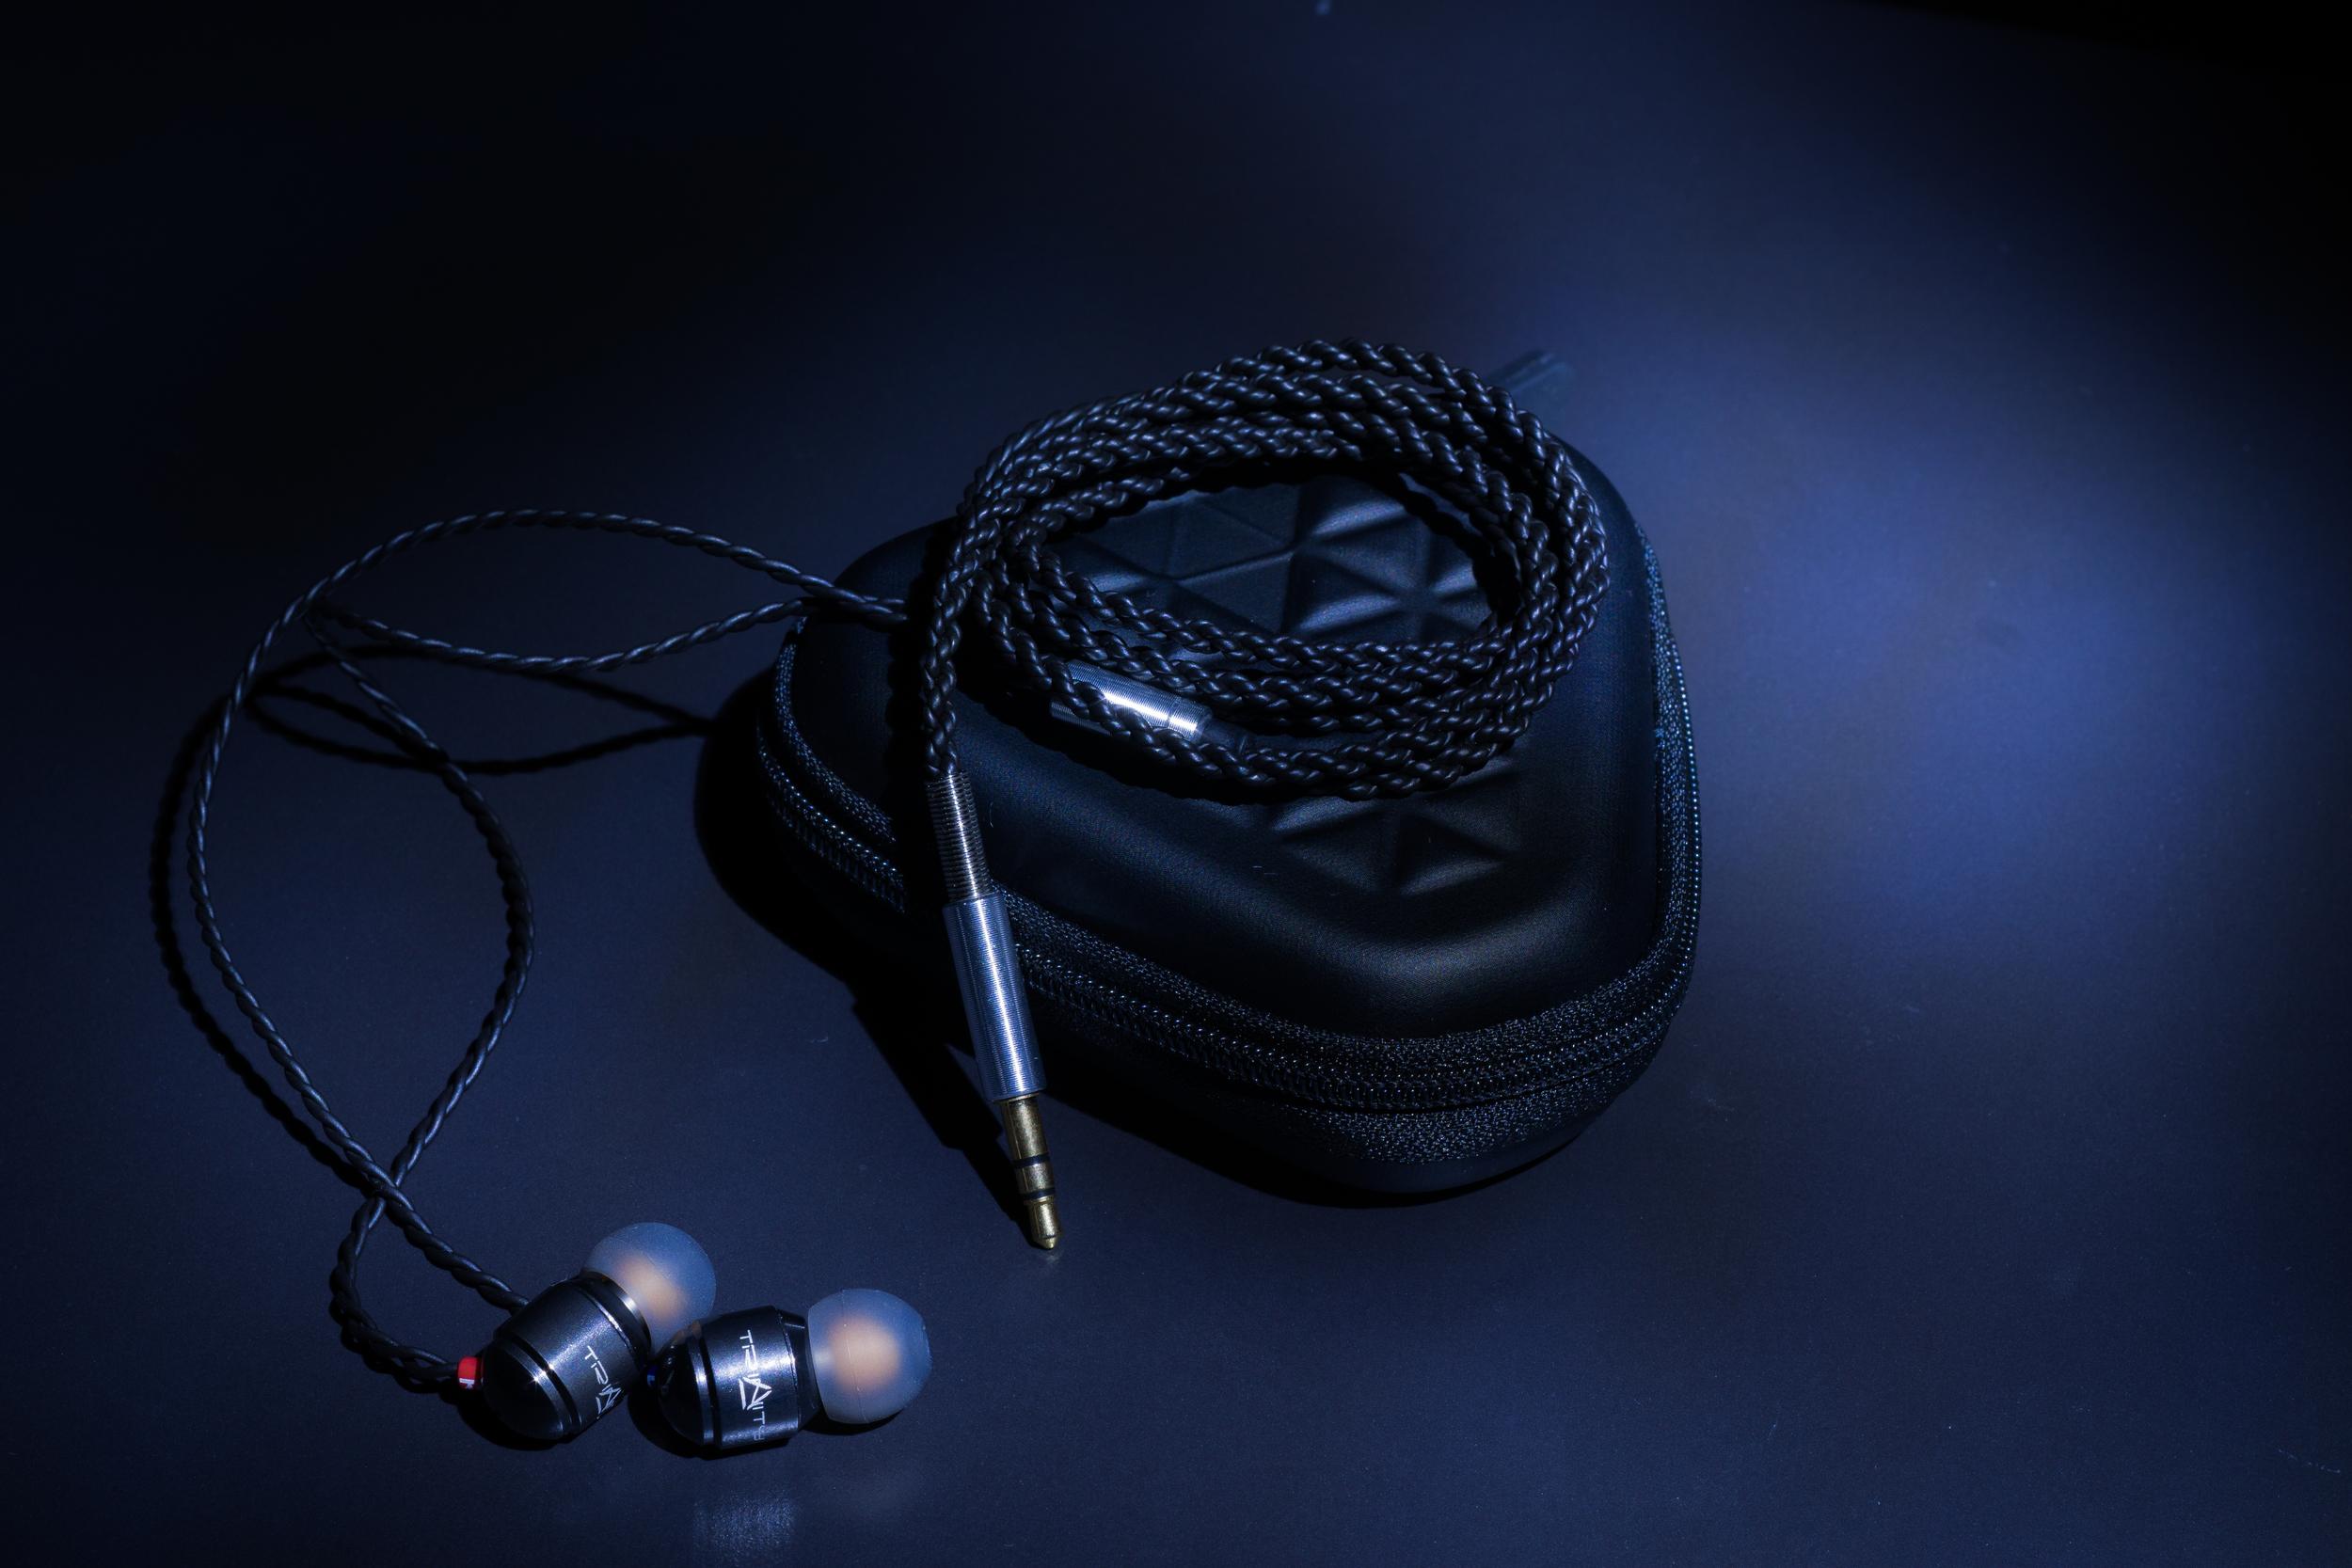 The Trinity Audio Engineering Delta in ear headphones with custom headphone carry case